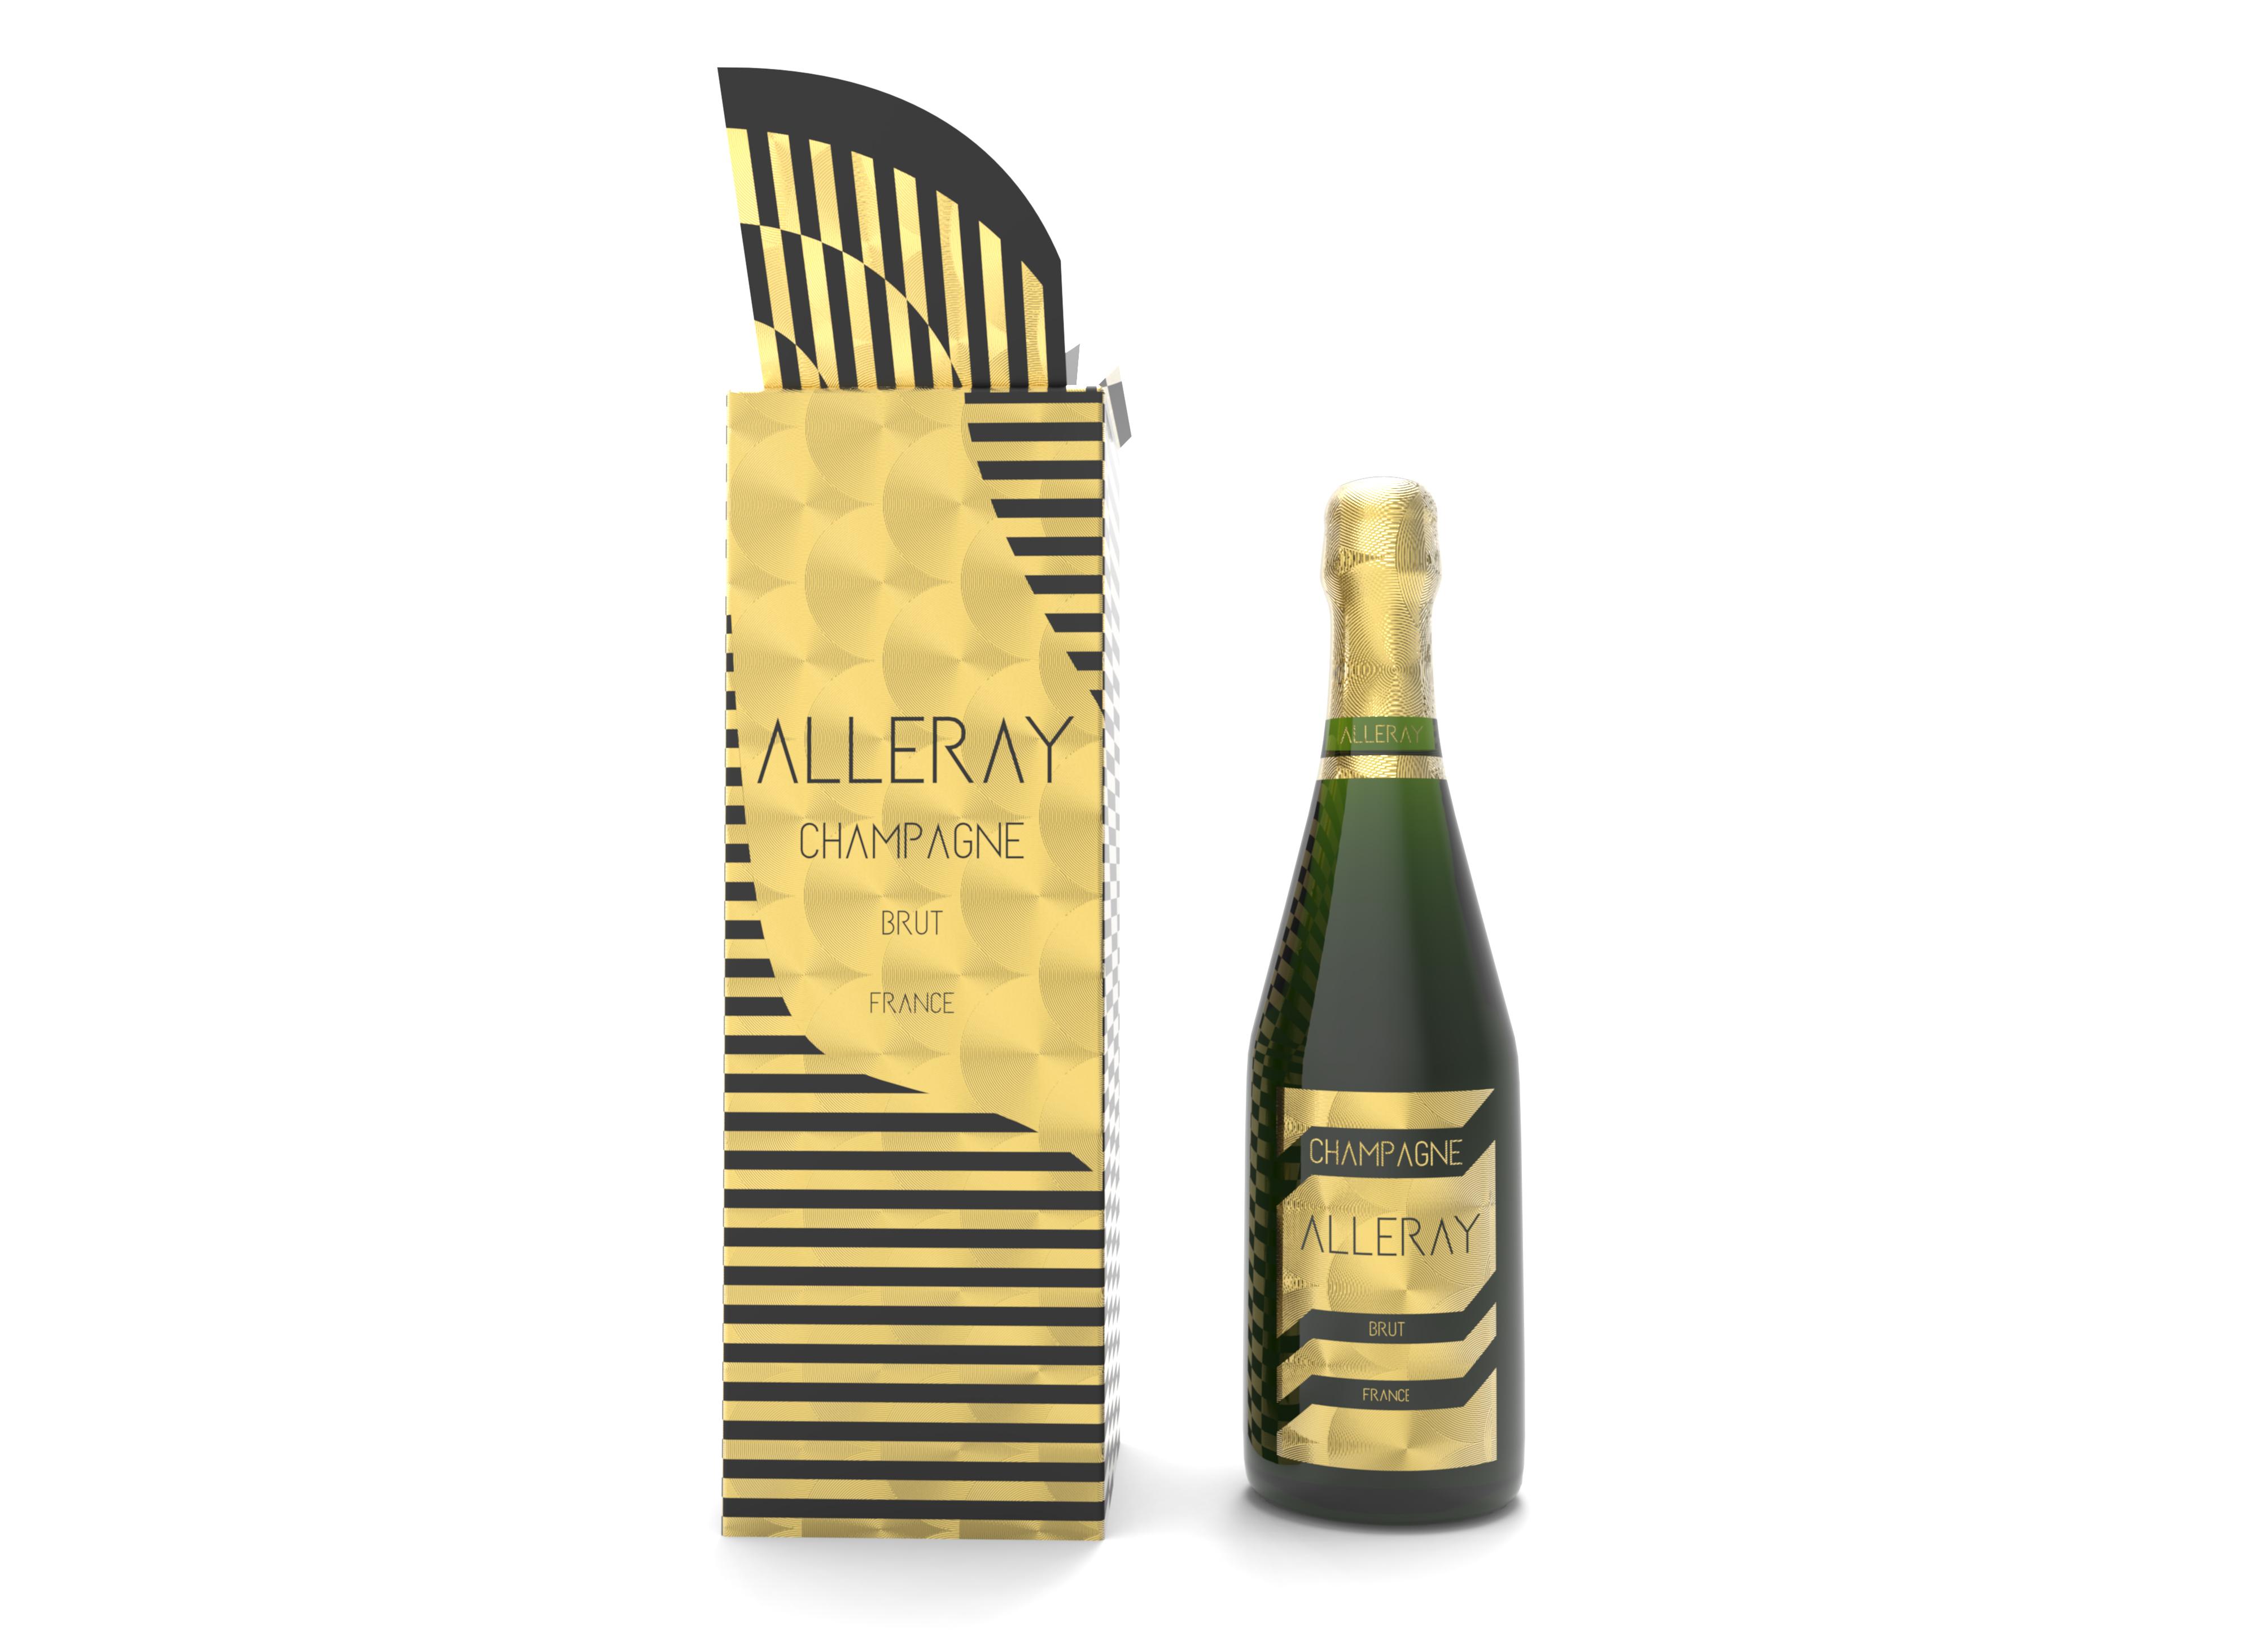 Champagne Frontal Botella y caja